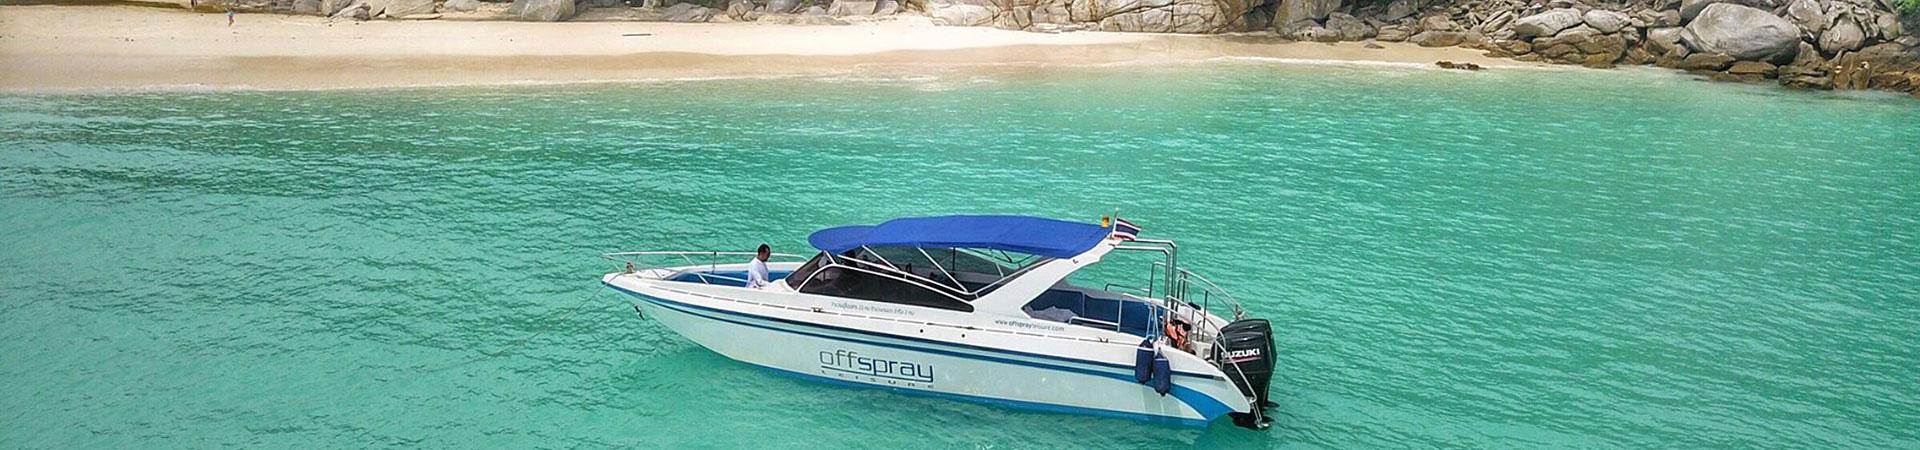 Boat Hire Phuket